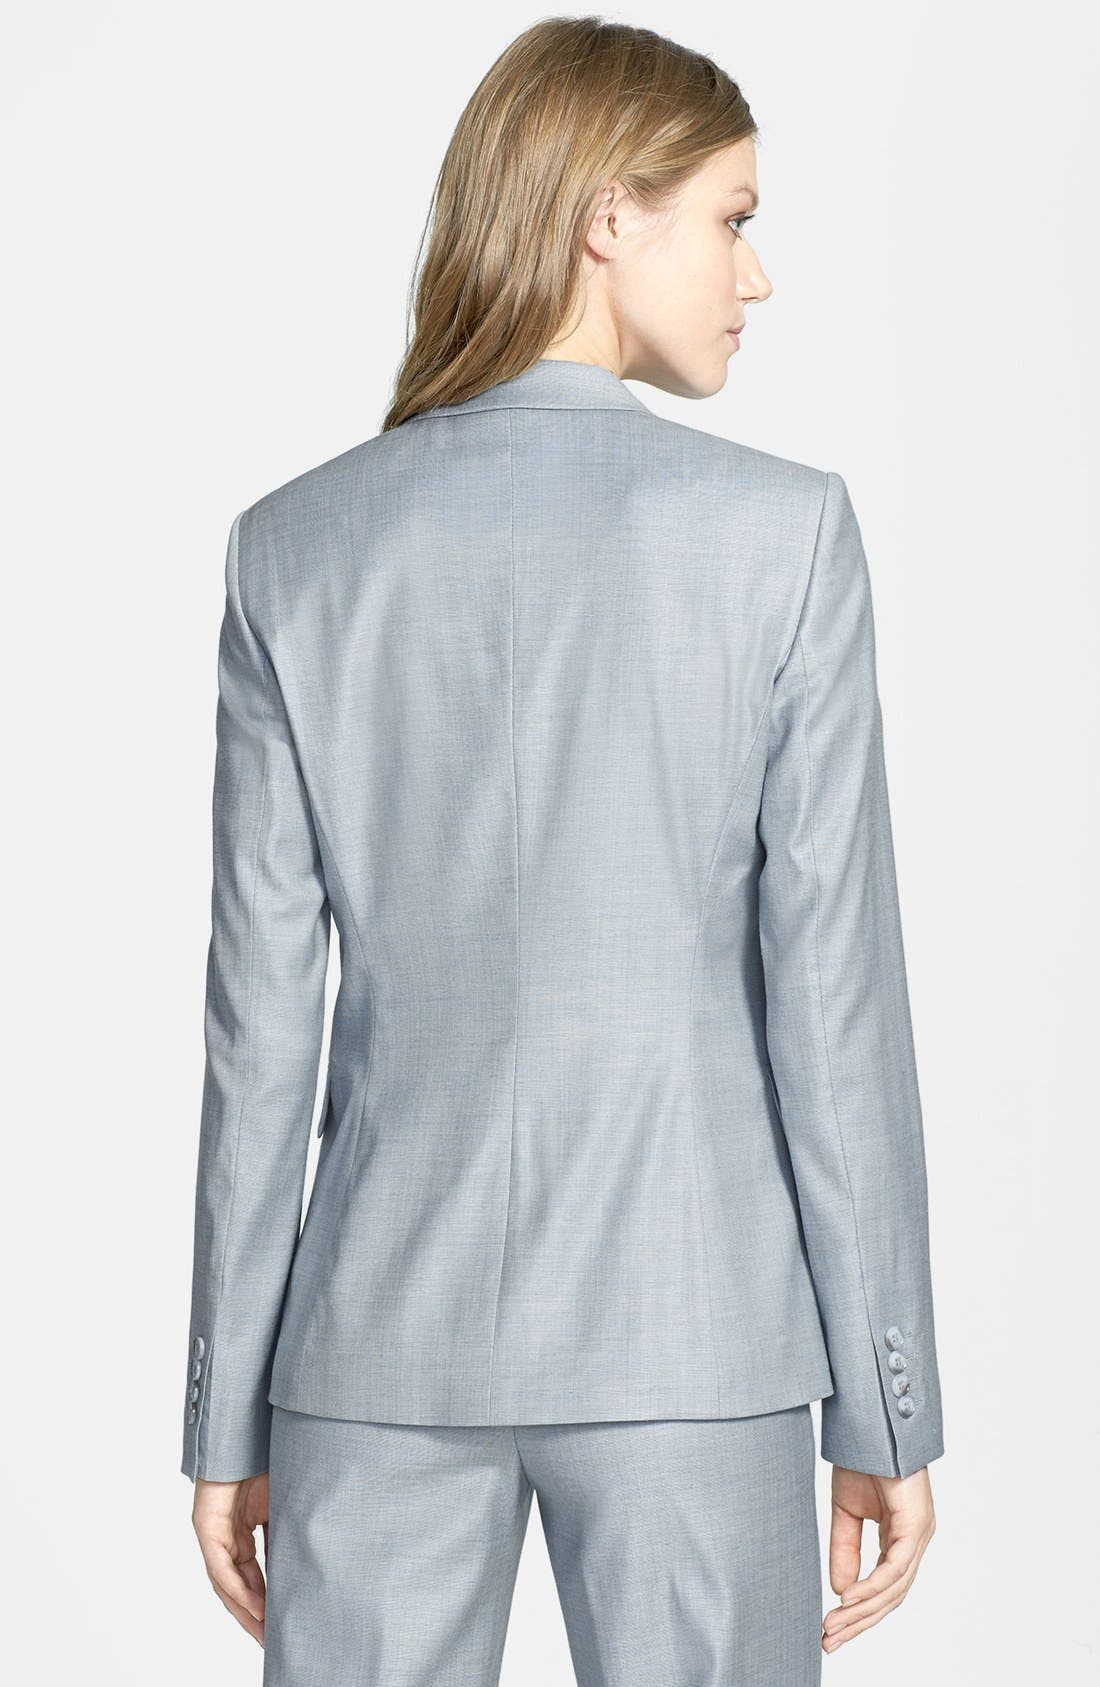 Alternate Image 2  - BOSS HUGO BOSS 'Juicy 6' Stretch Wool Jacket